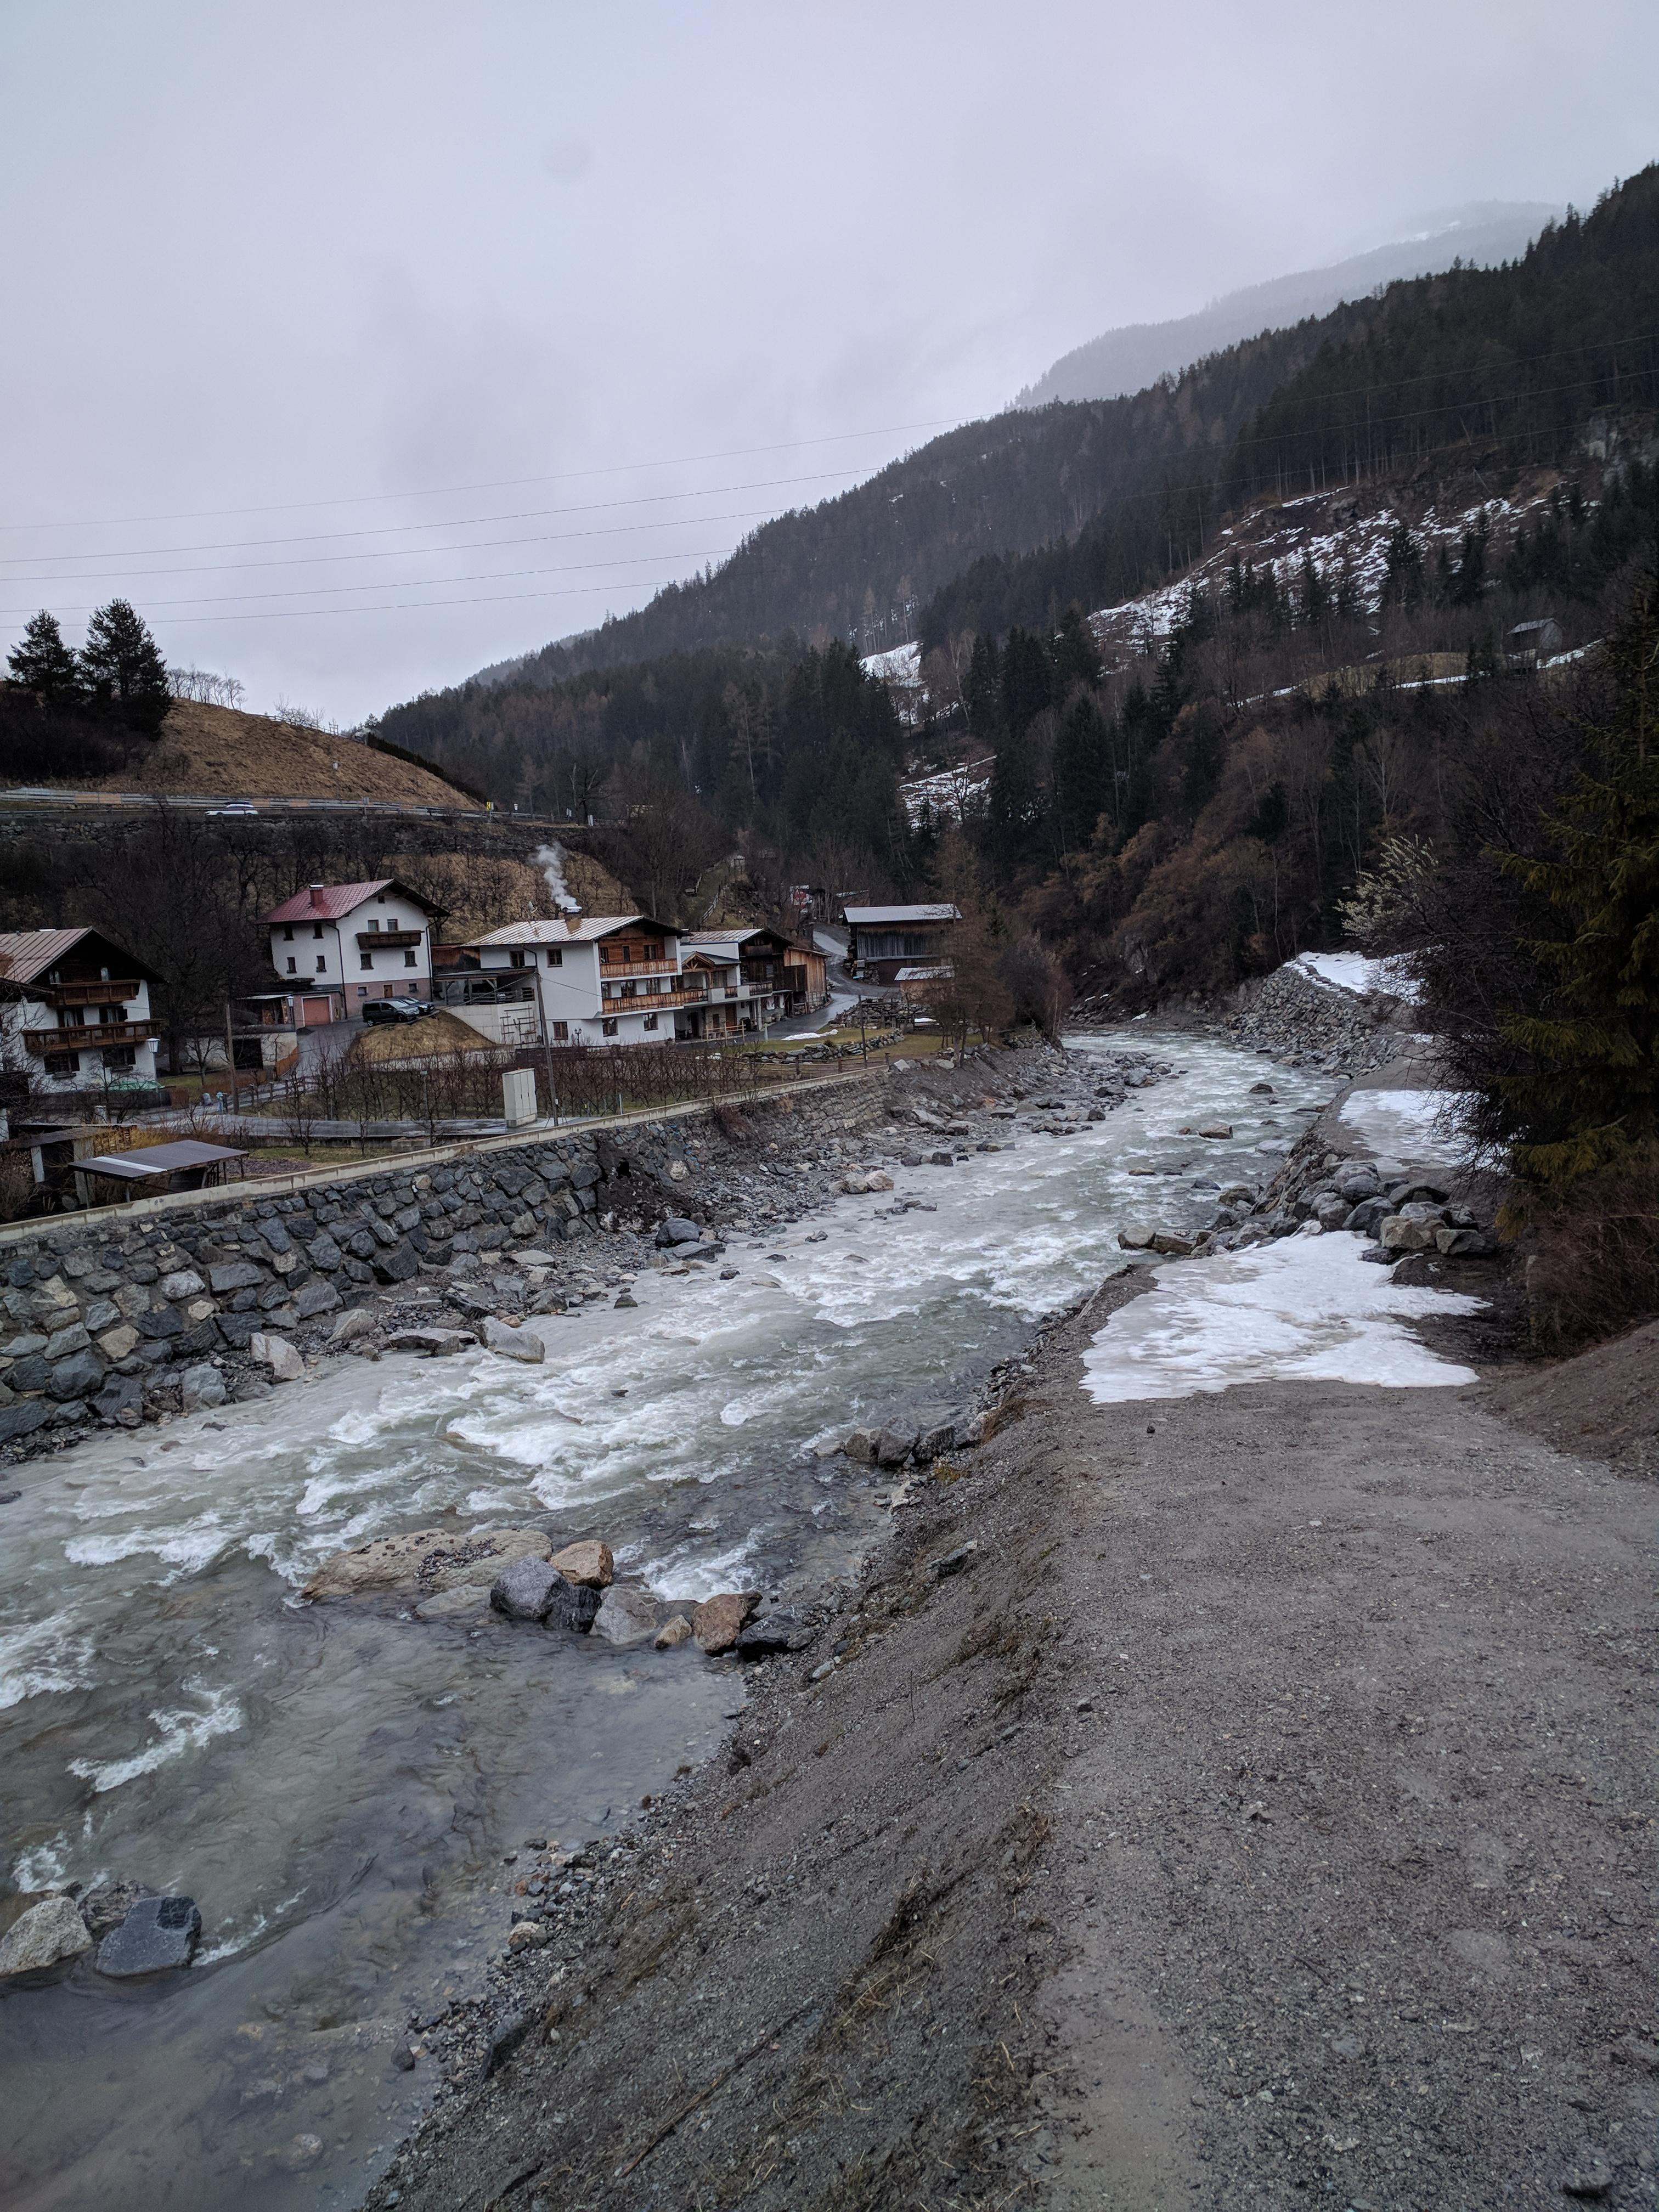 Hochwasserschutz an der Sanna - Pianner Schwall